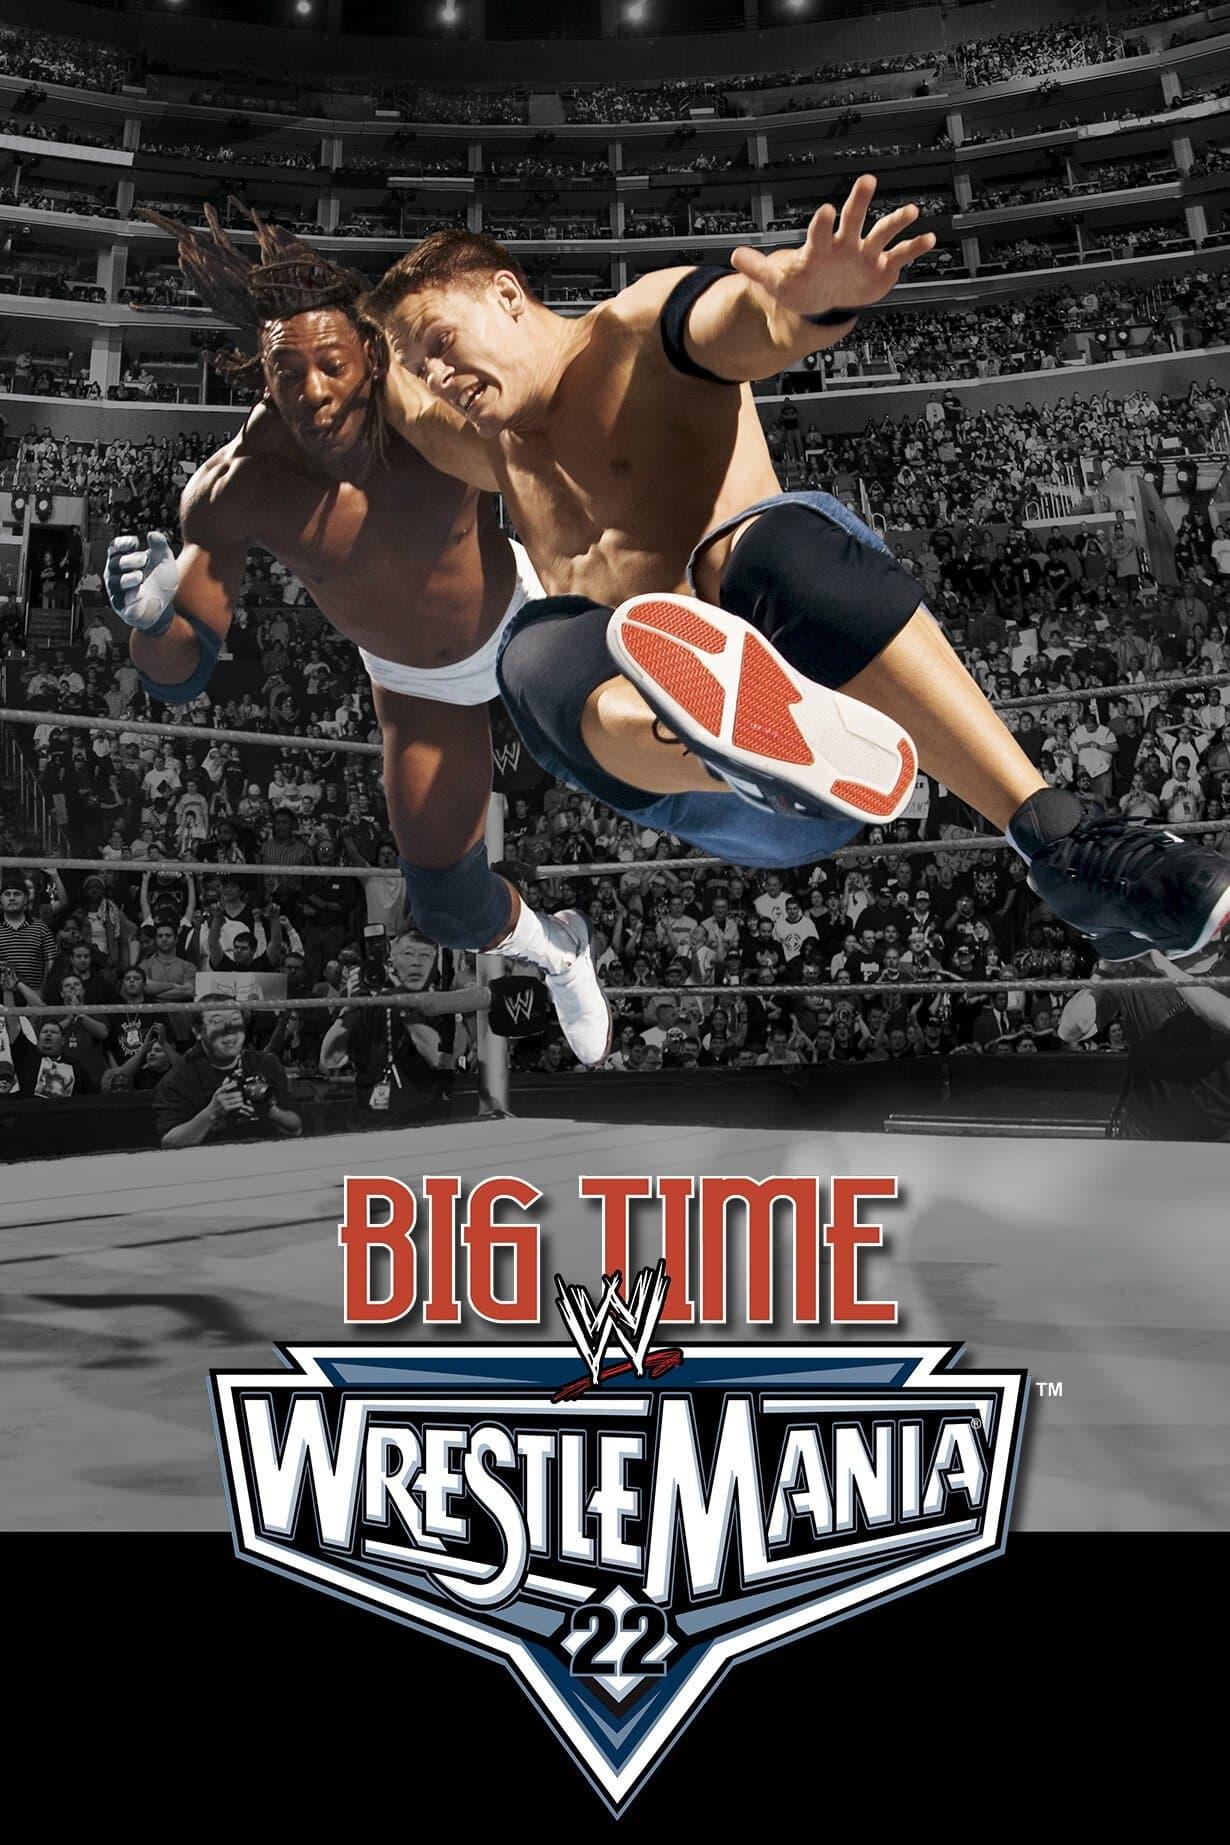 WWE WrestleMania 22